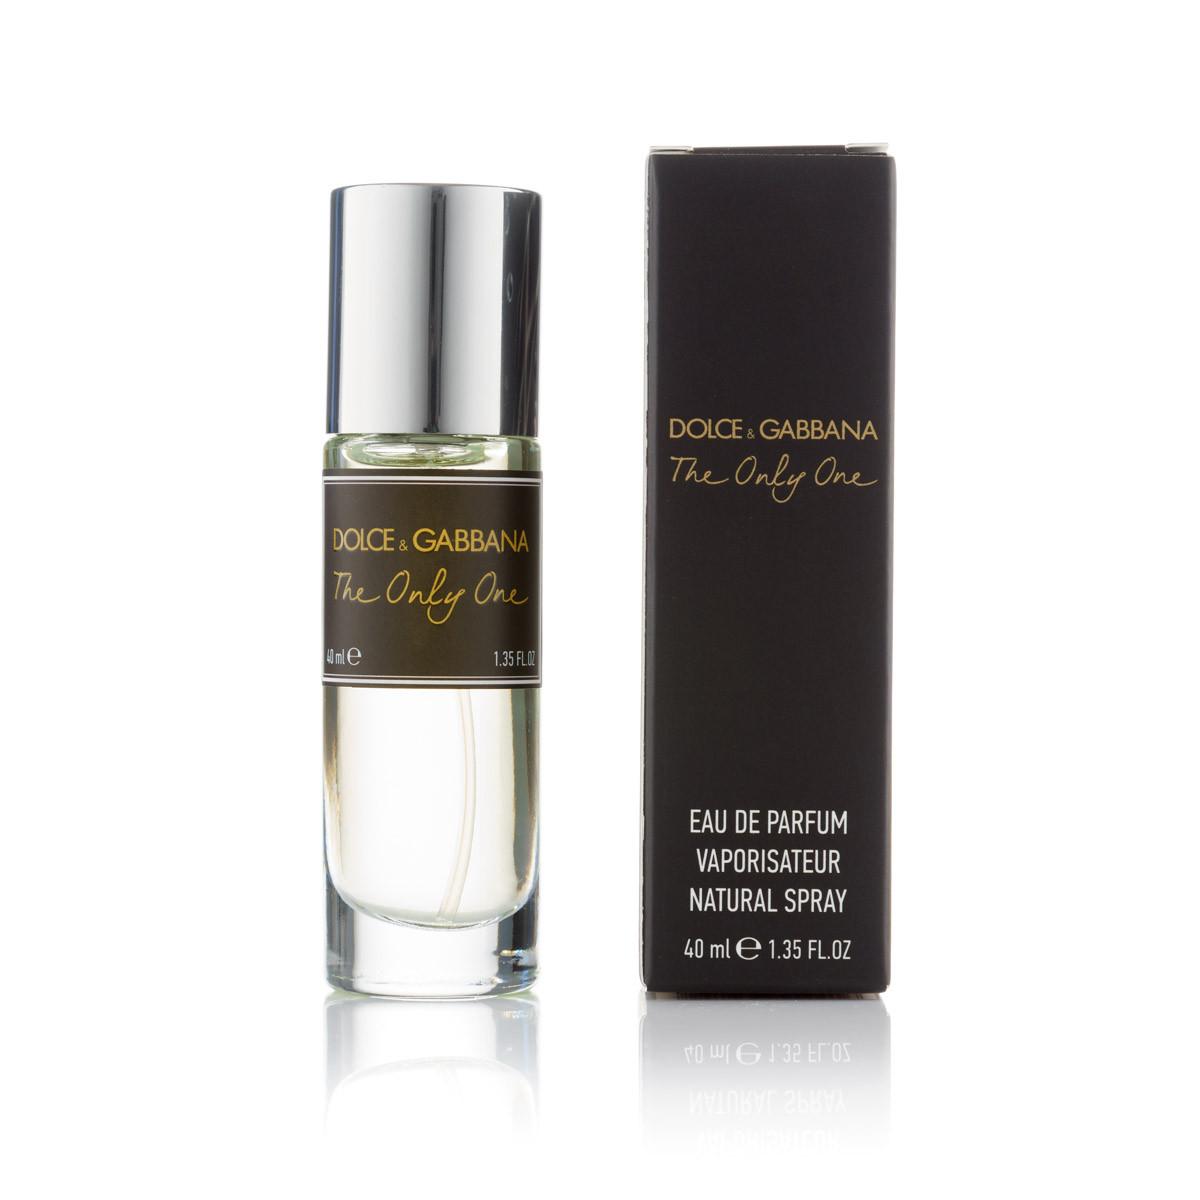 Жіночий міні парфуму Dolce&Gabbana The Only One 40 Ml